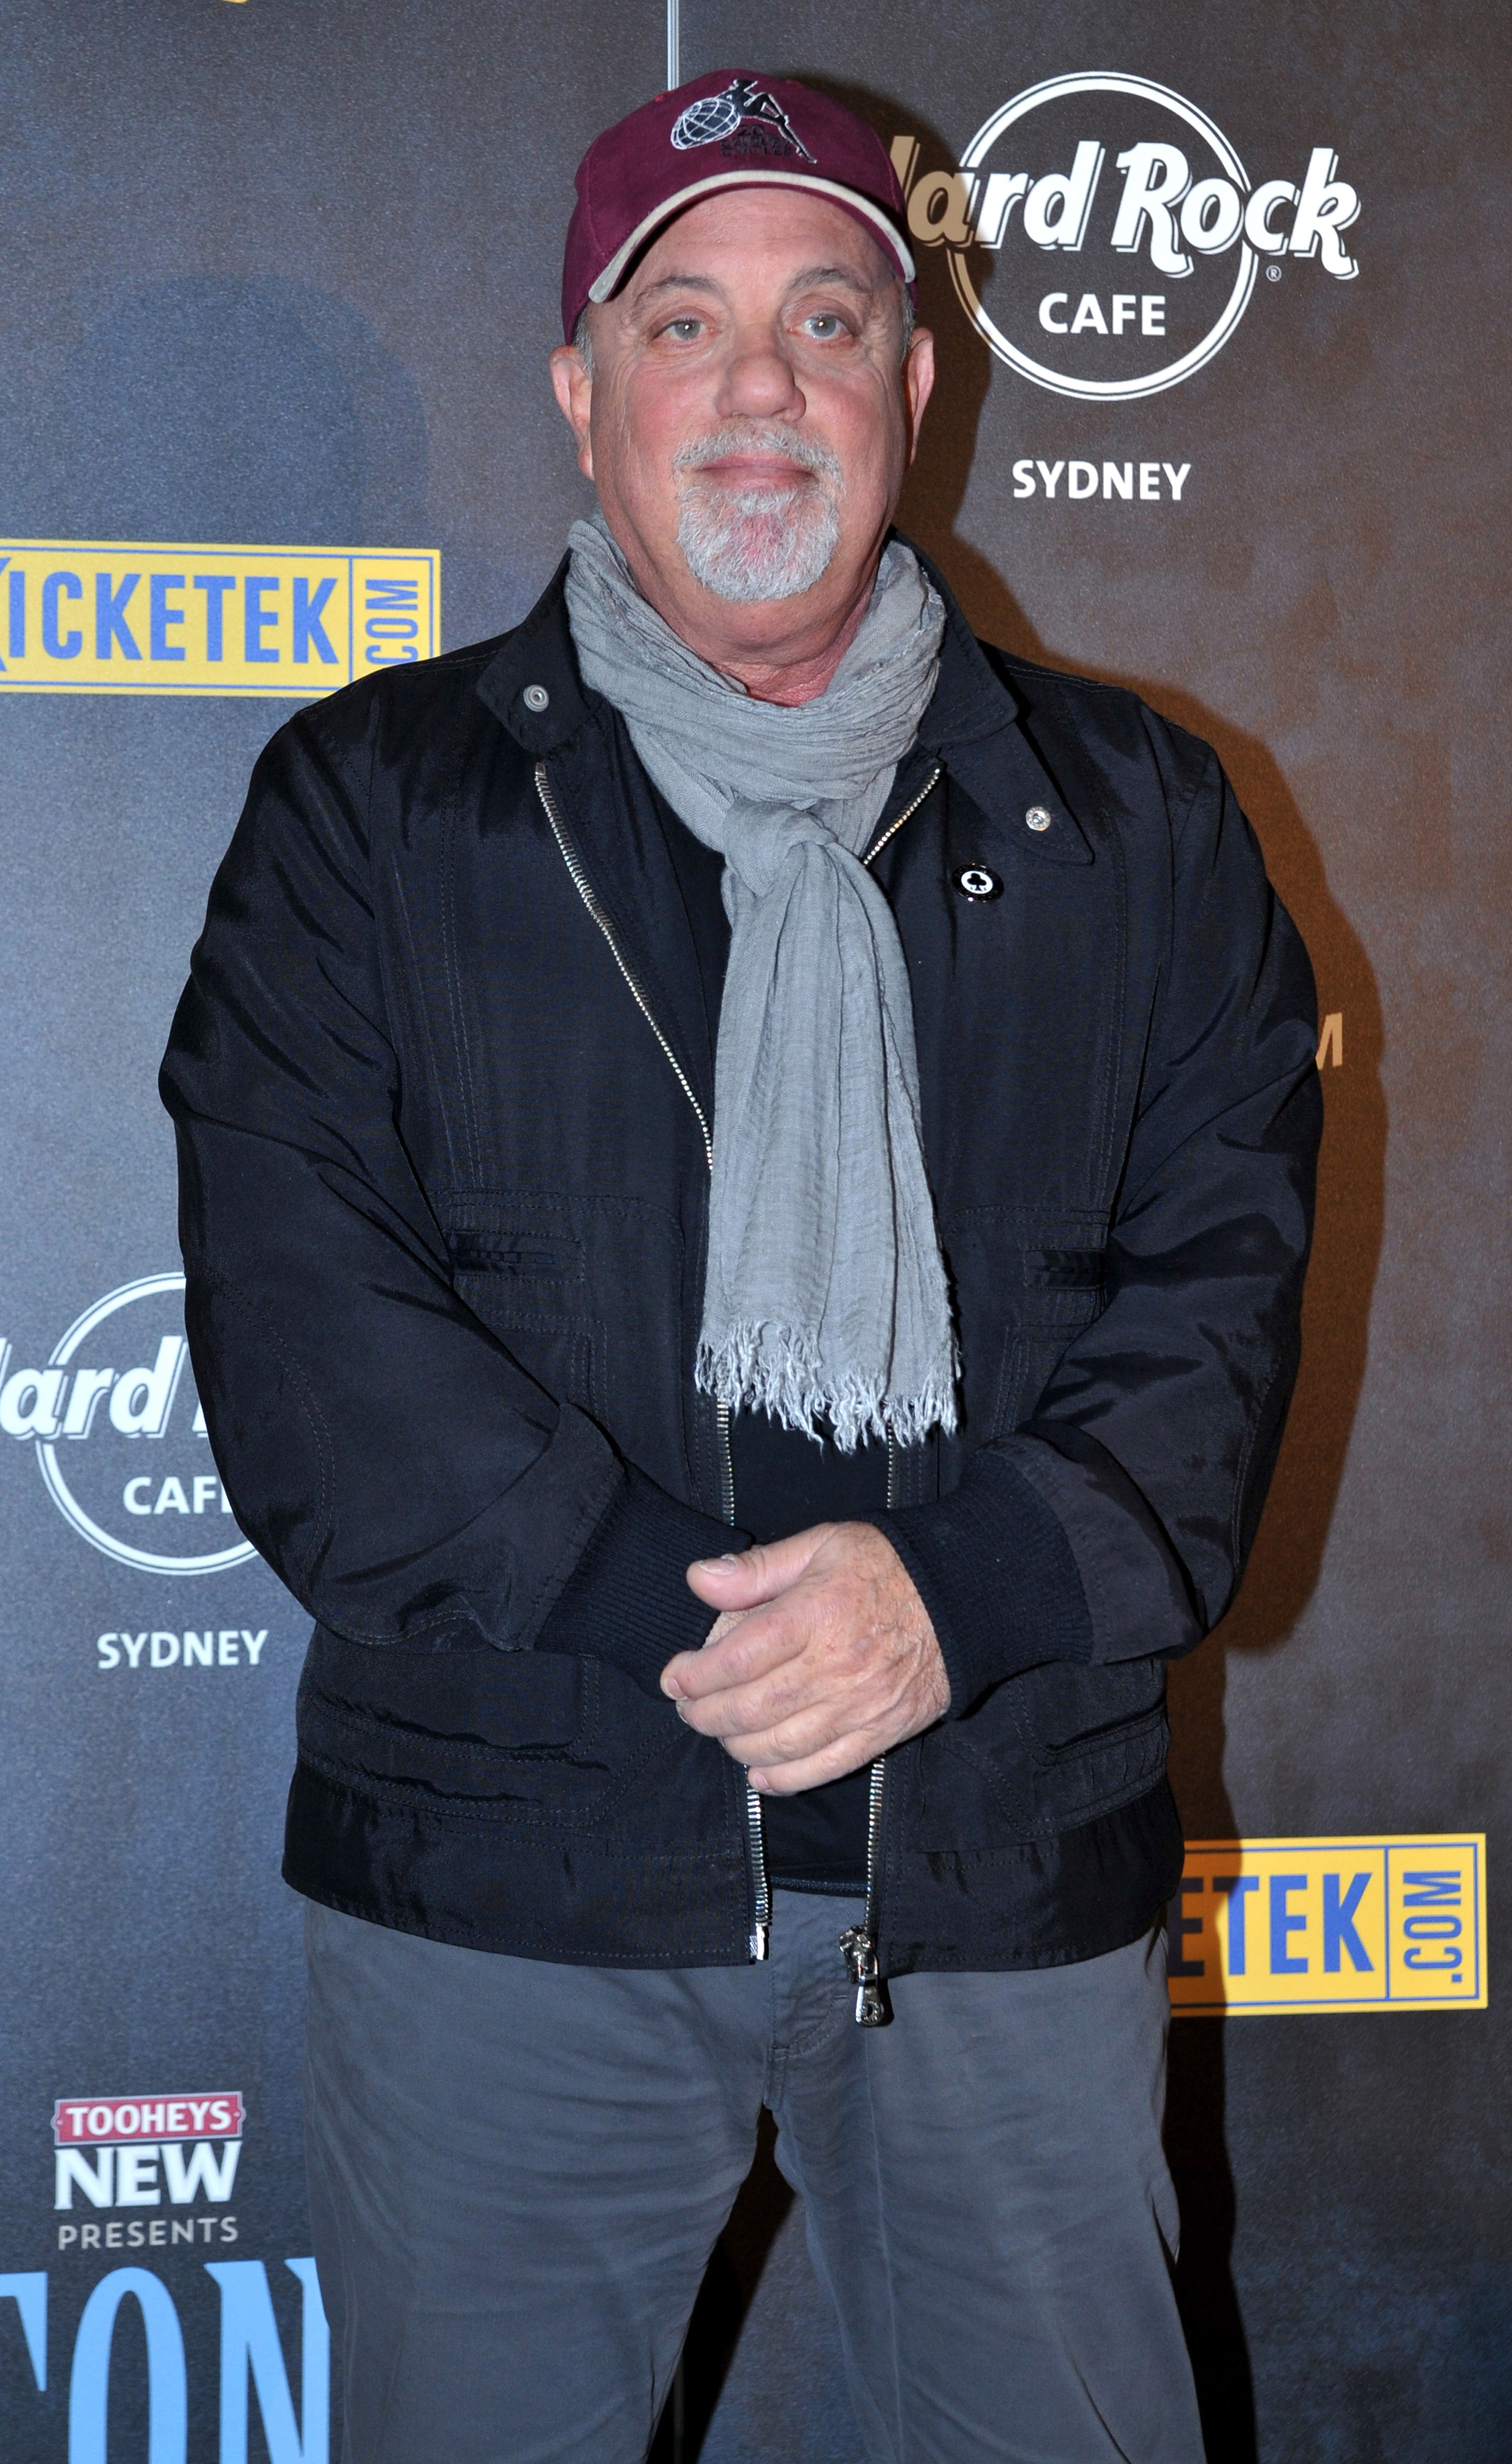 Billy Joel was behind Bruce Springsteen's recent motorcycle bust